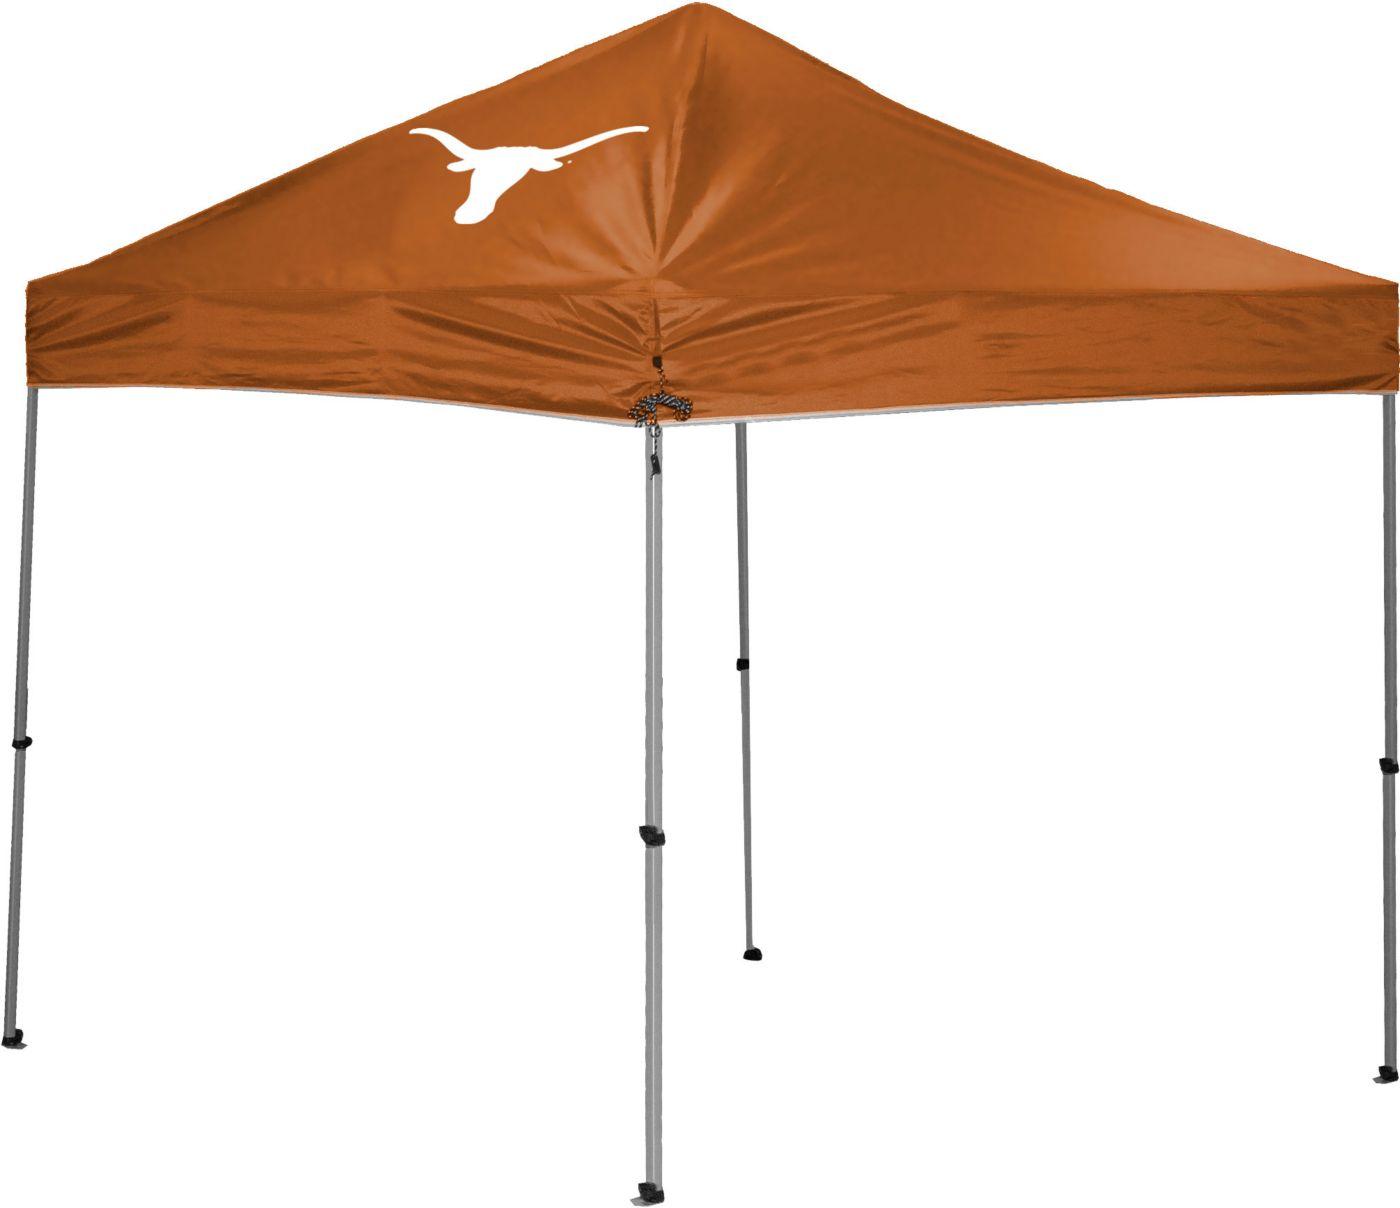 Rawlings Texas Longhorns 9' x 9' Straight Canopy Tent